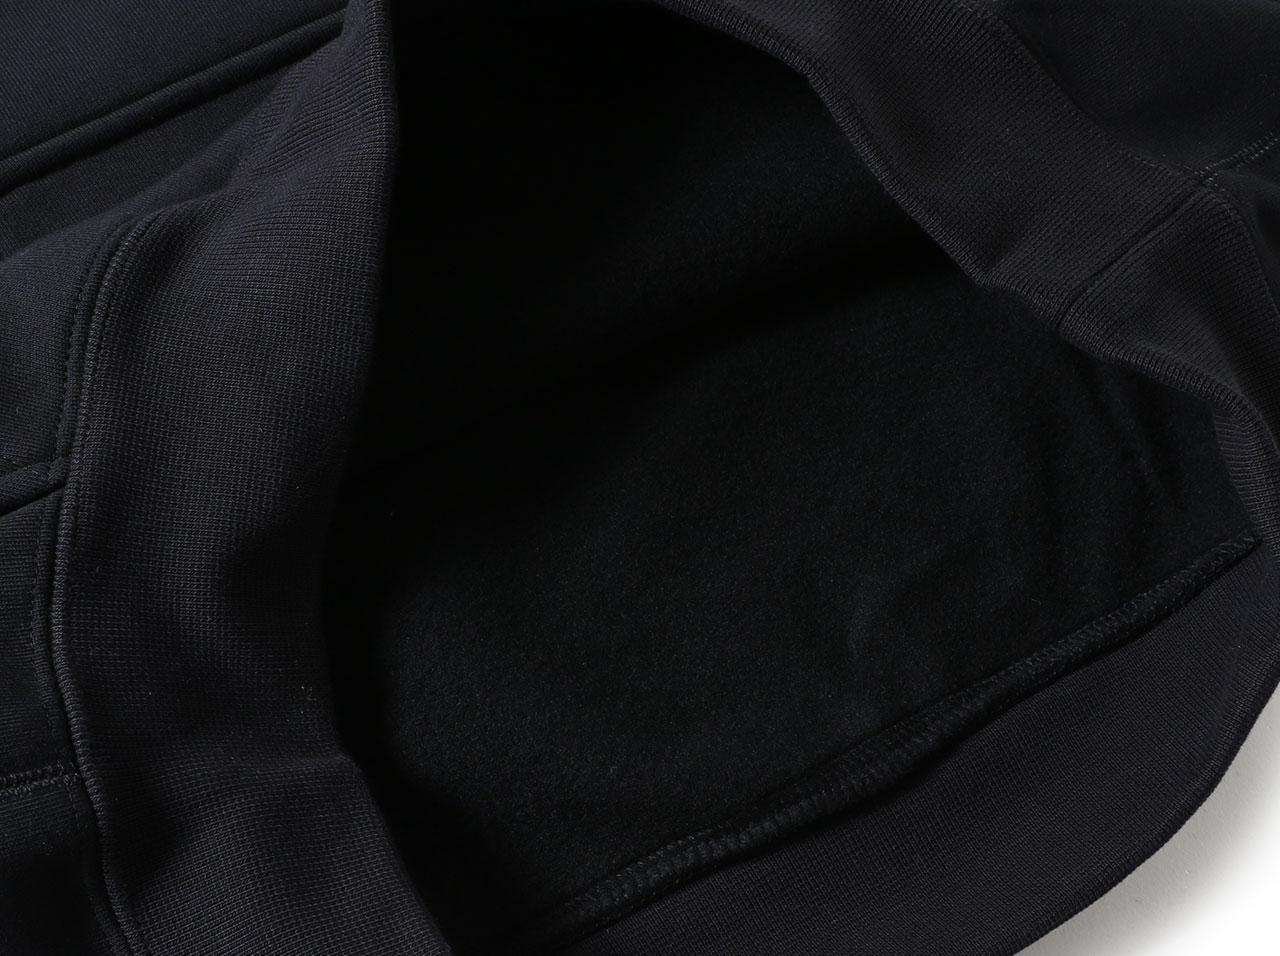 【SALE】NIKE M NRG HOODIE - BLACK